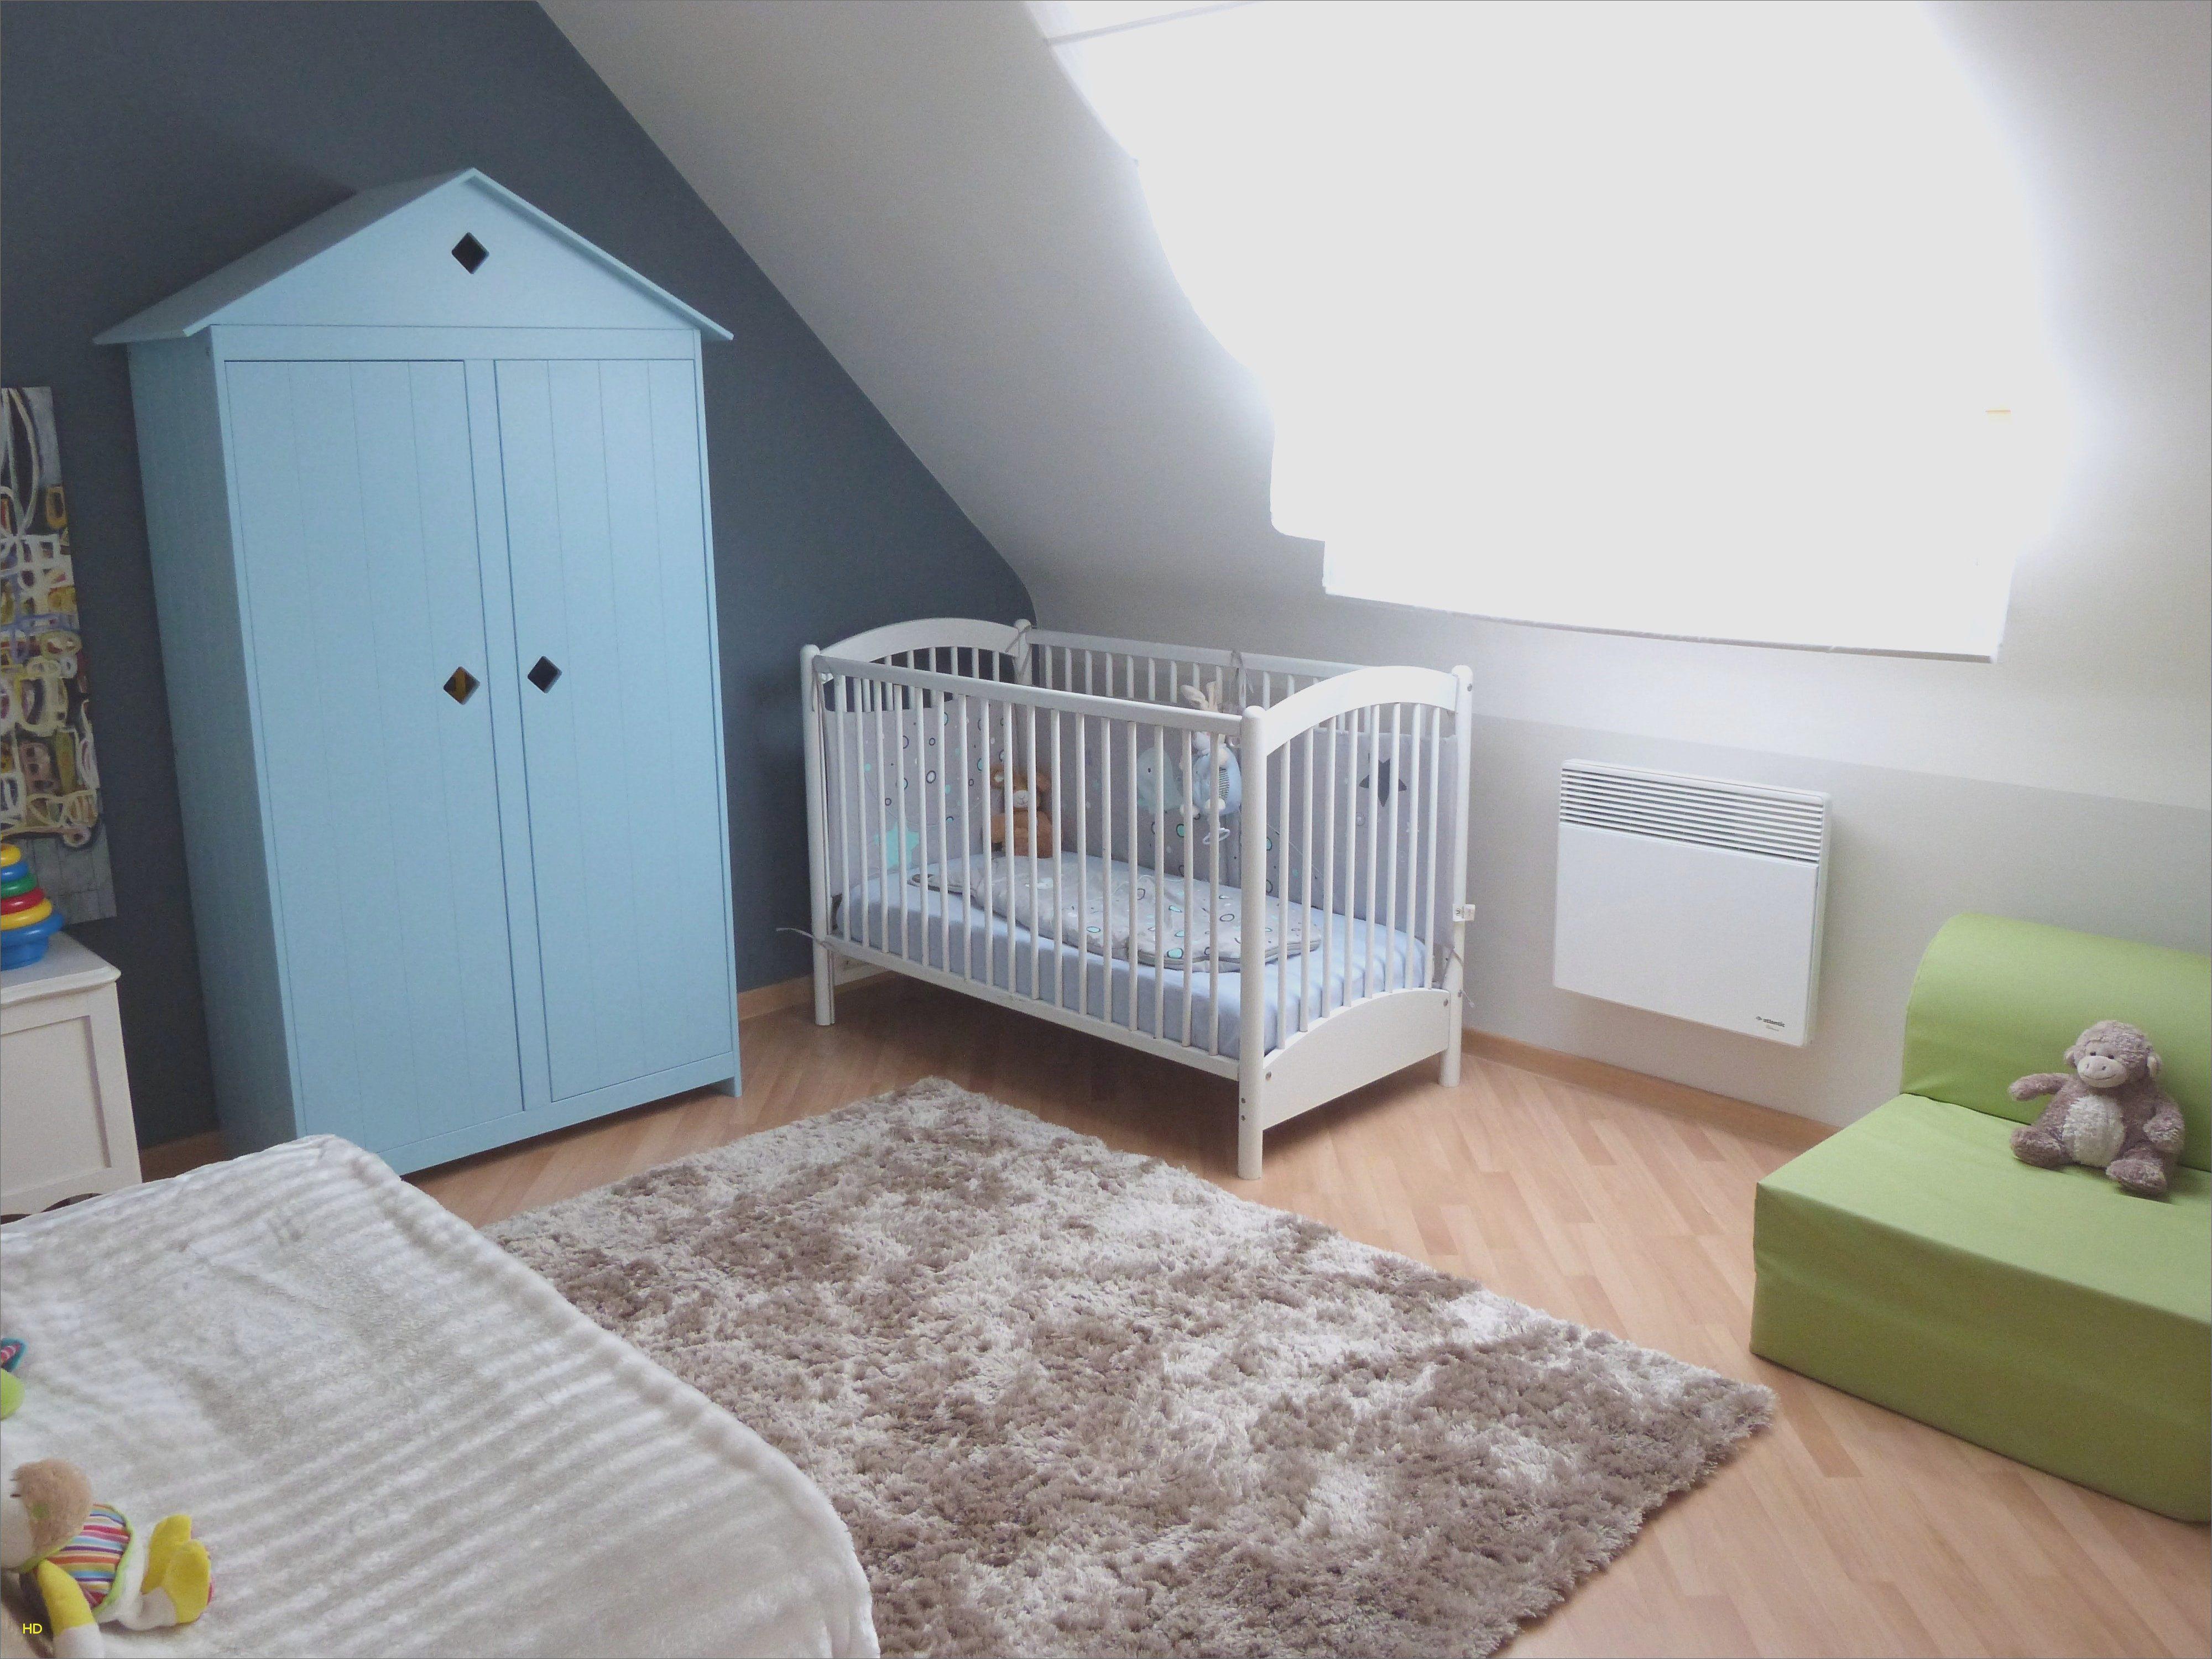 Lit Superposé Adulte Ikea Douce Charmant Chambre Enfant Lit Superposé Et Lit Bine Ikea Maison Design